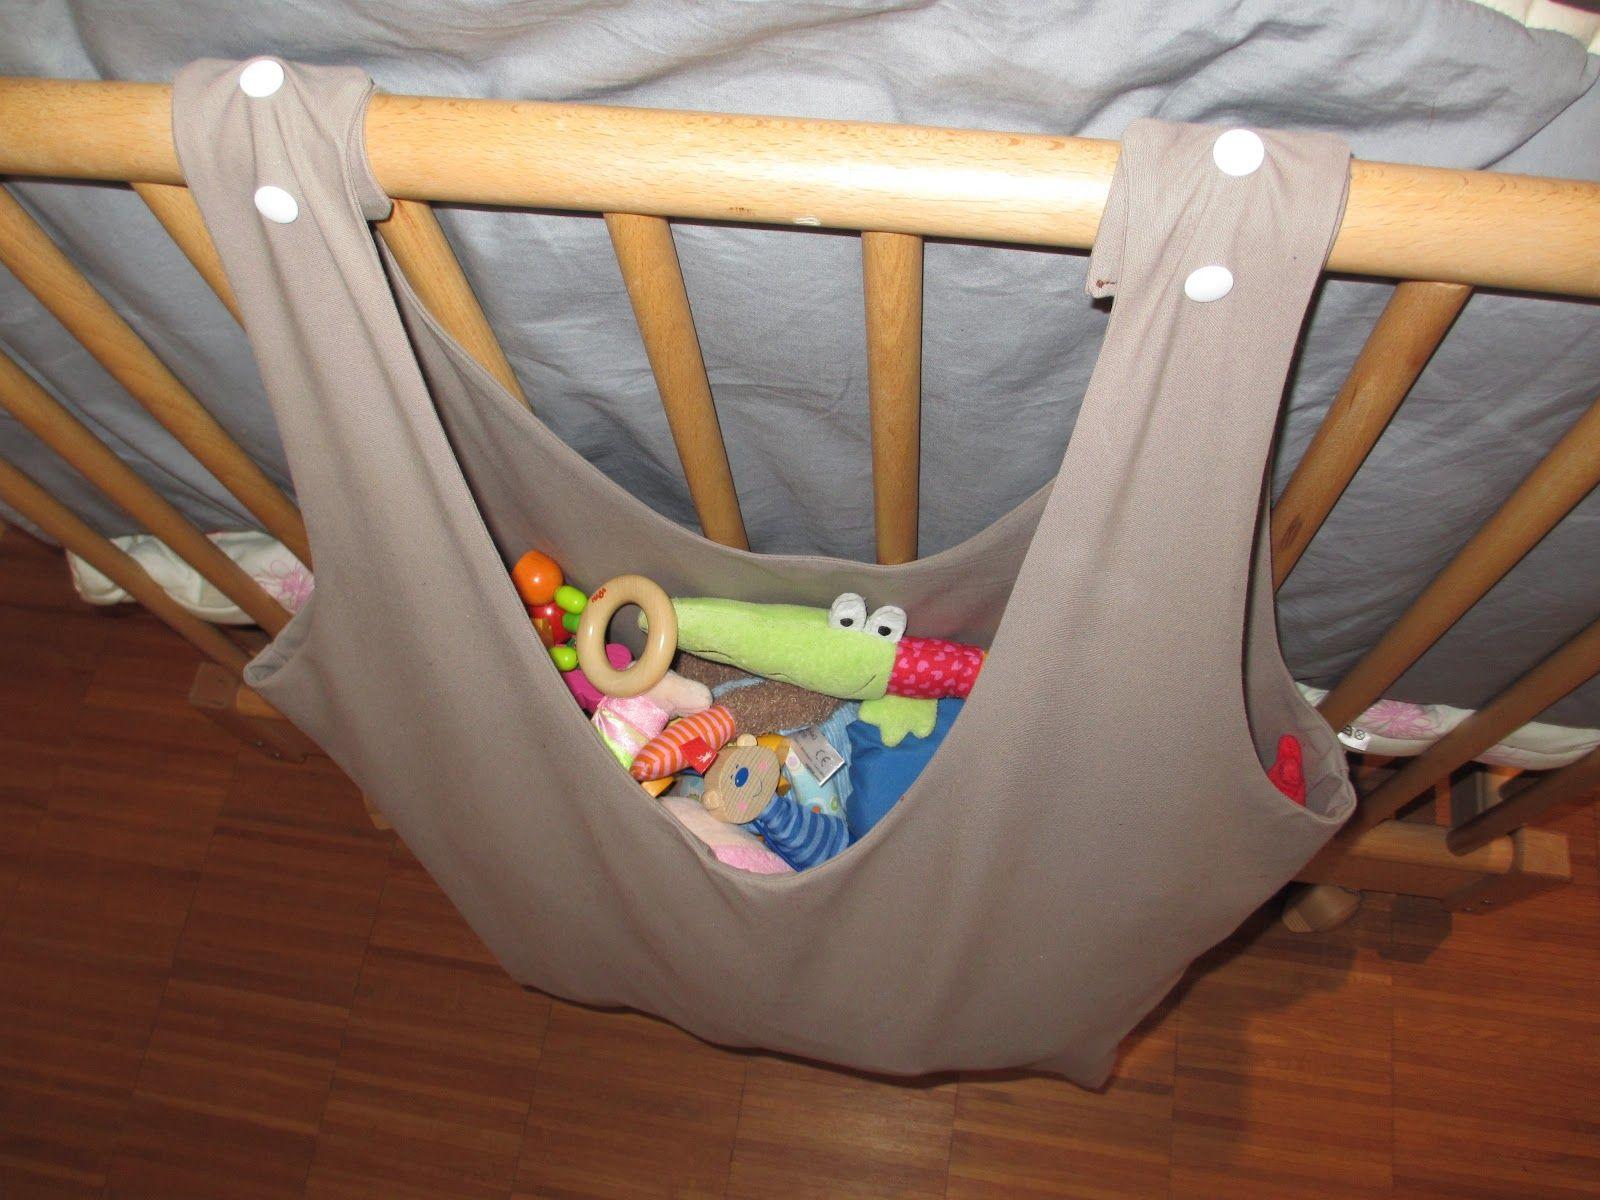 Kinderzimmer Accessoires Nähen | Bibkunstschuur